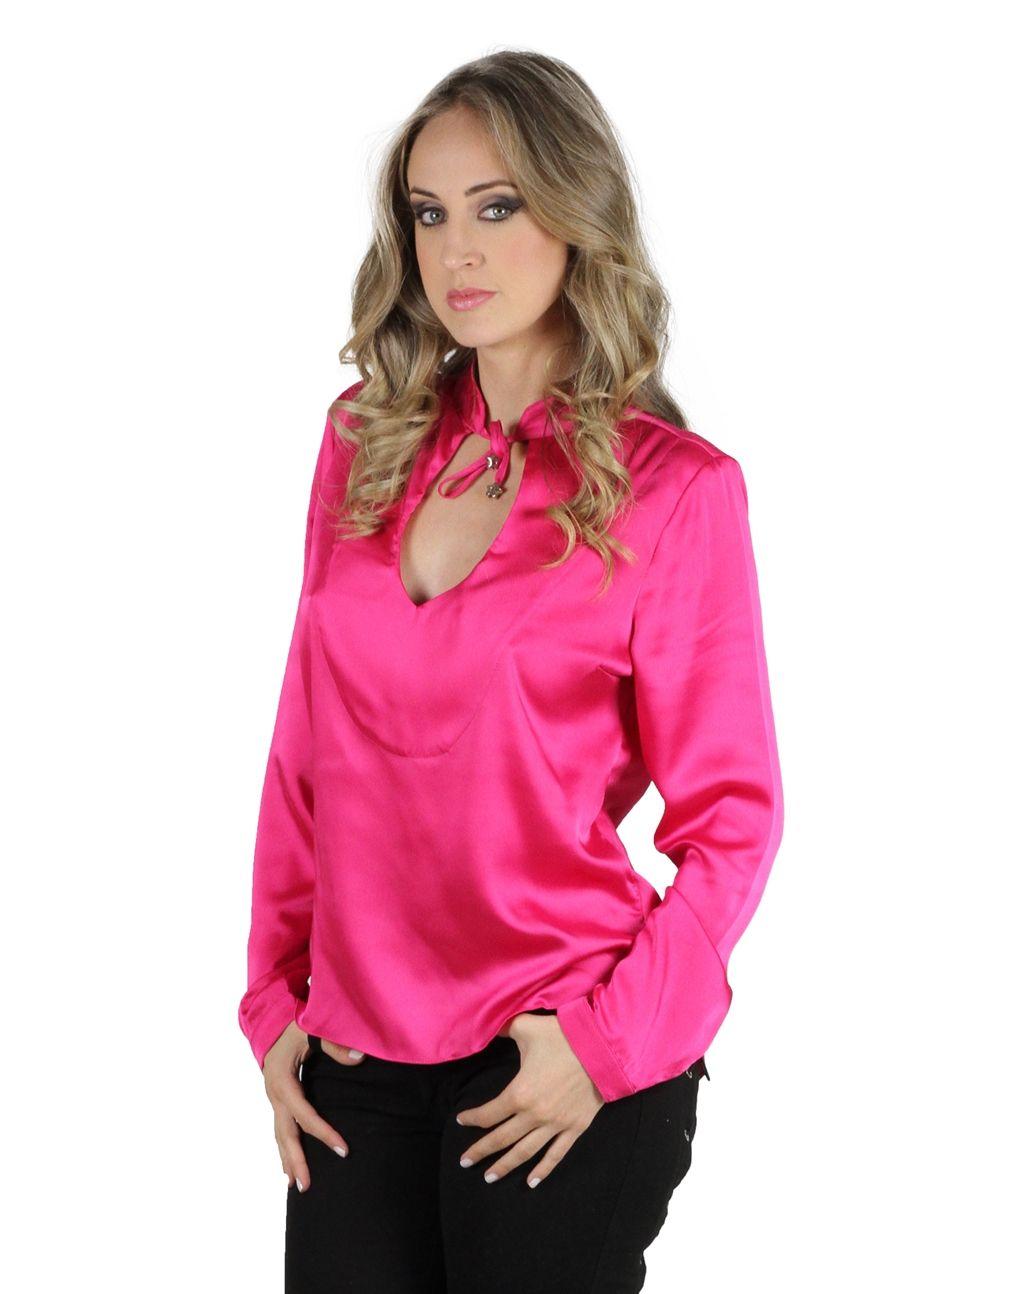 Fuscia pink satin blouse | satin | Pinterest